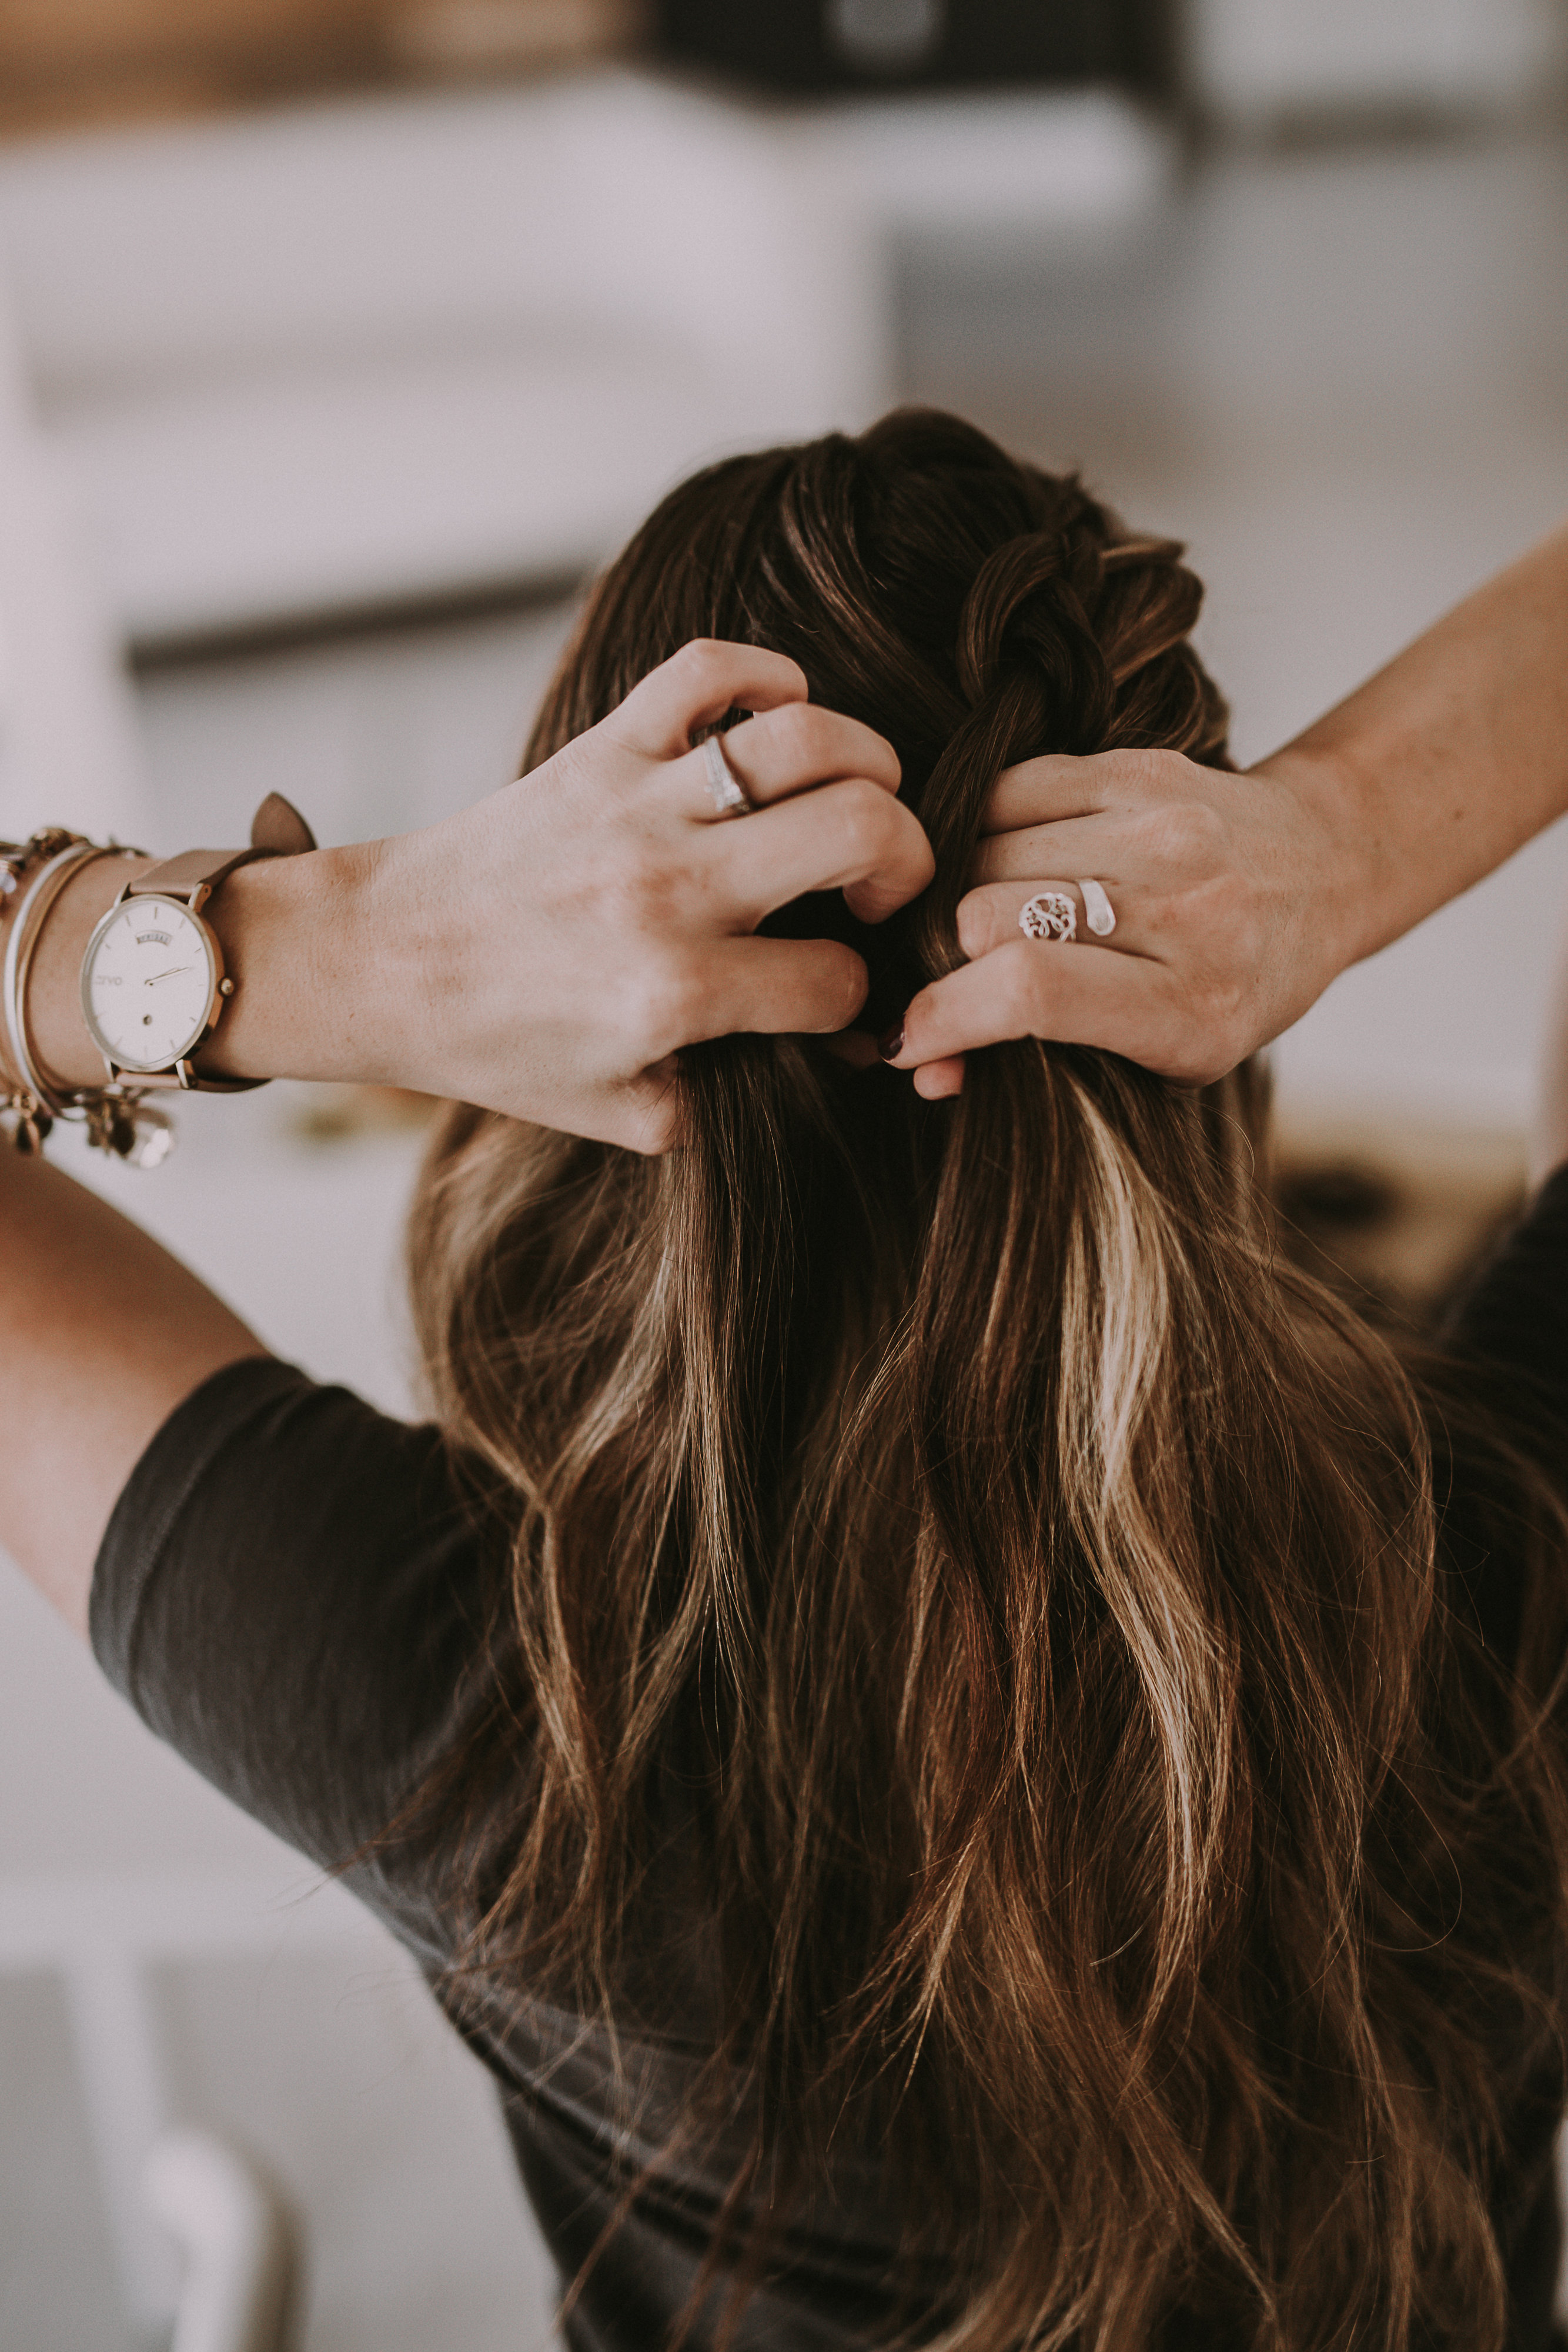 FRENCH BRAID BUN HOLIDAY HAIRSTYLE TUTORIAL by Utah beauty blogger Dani Marie